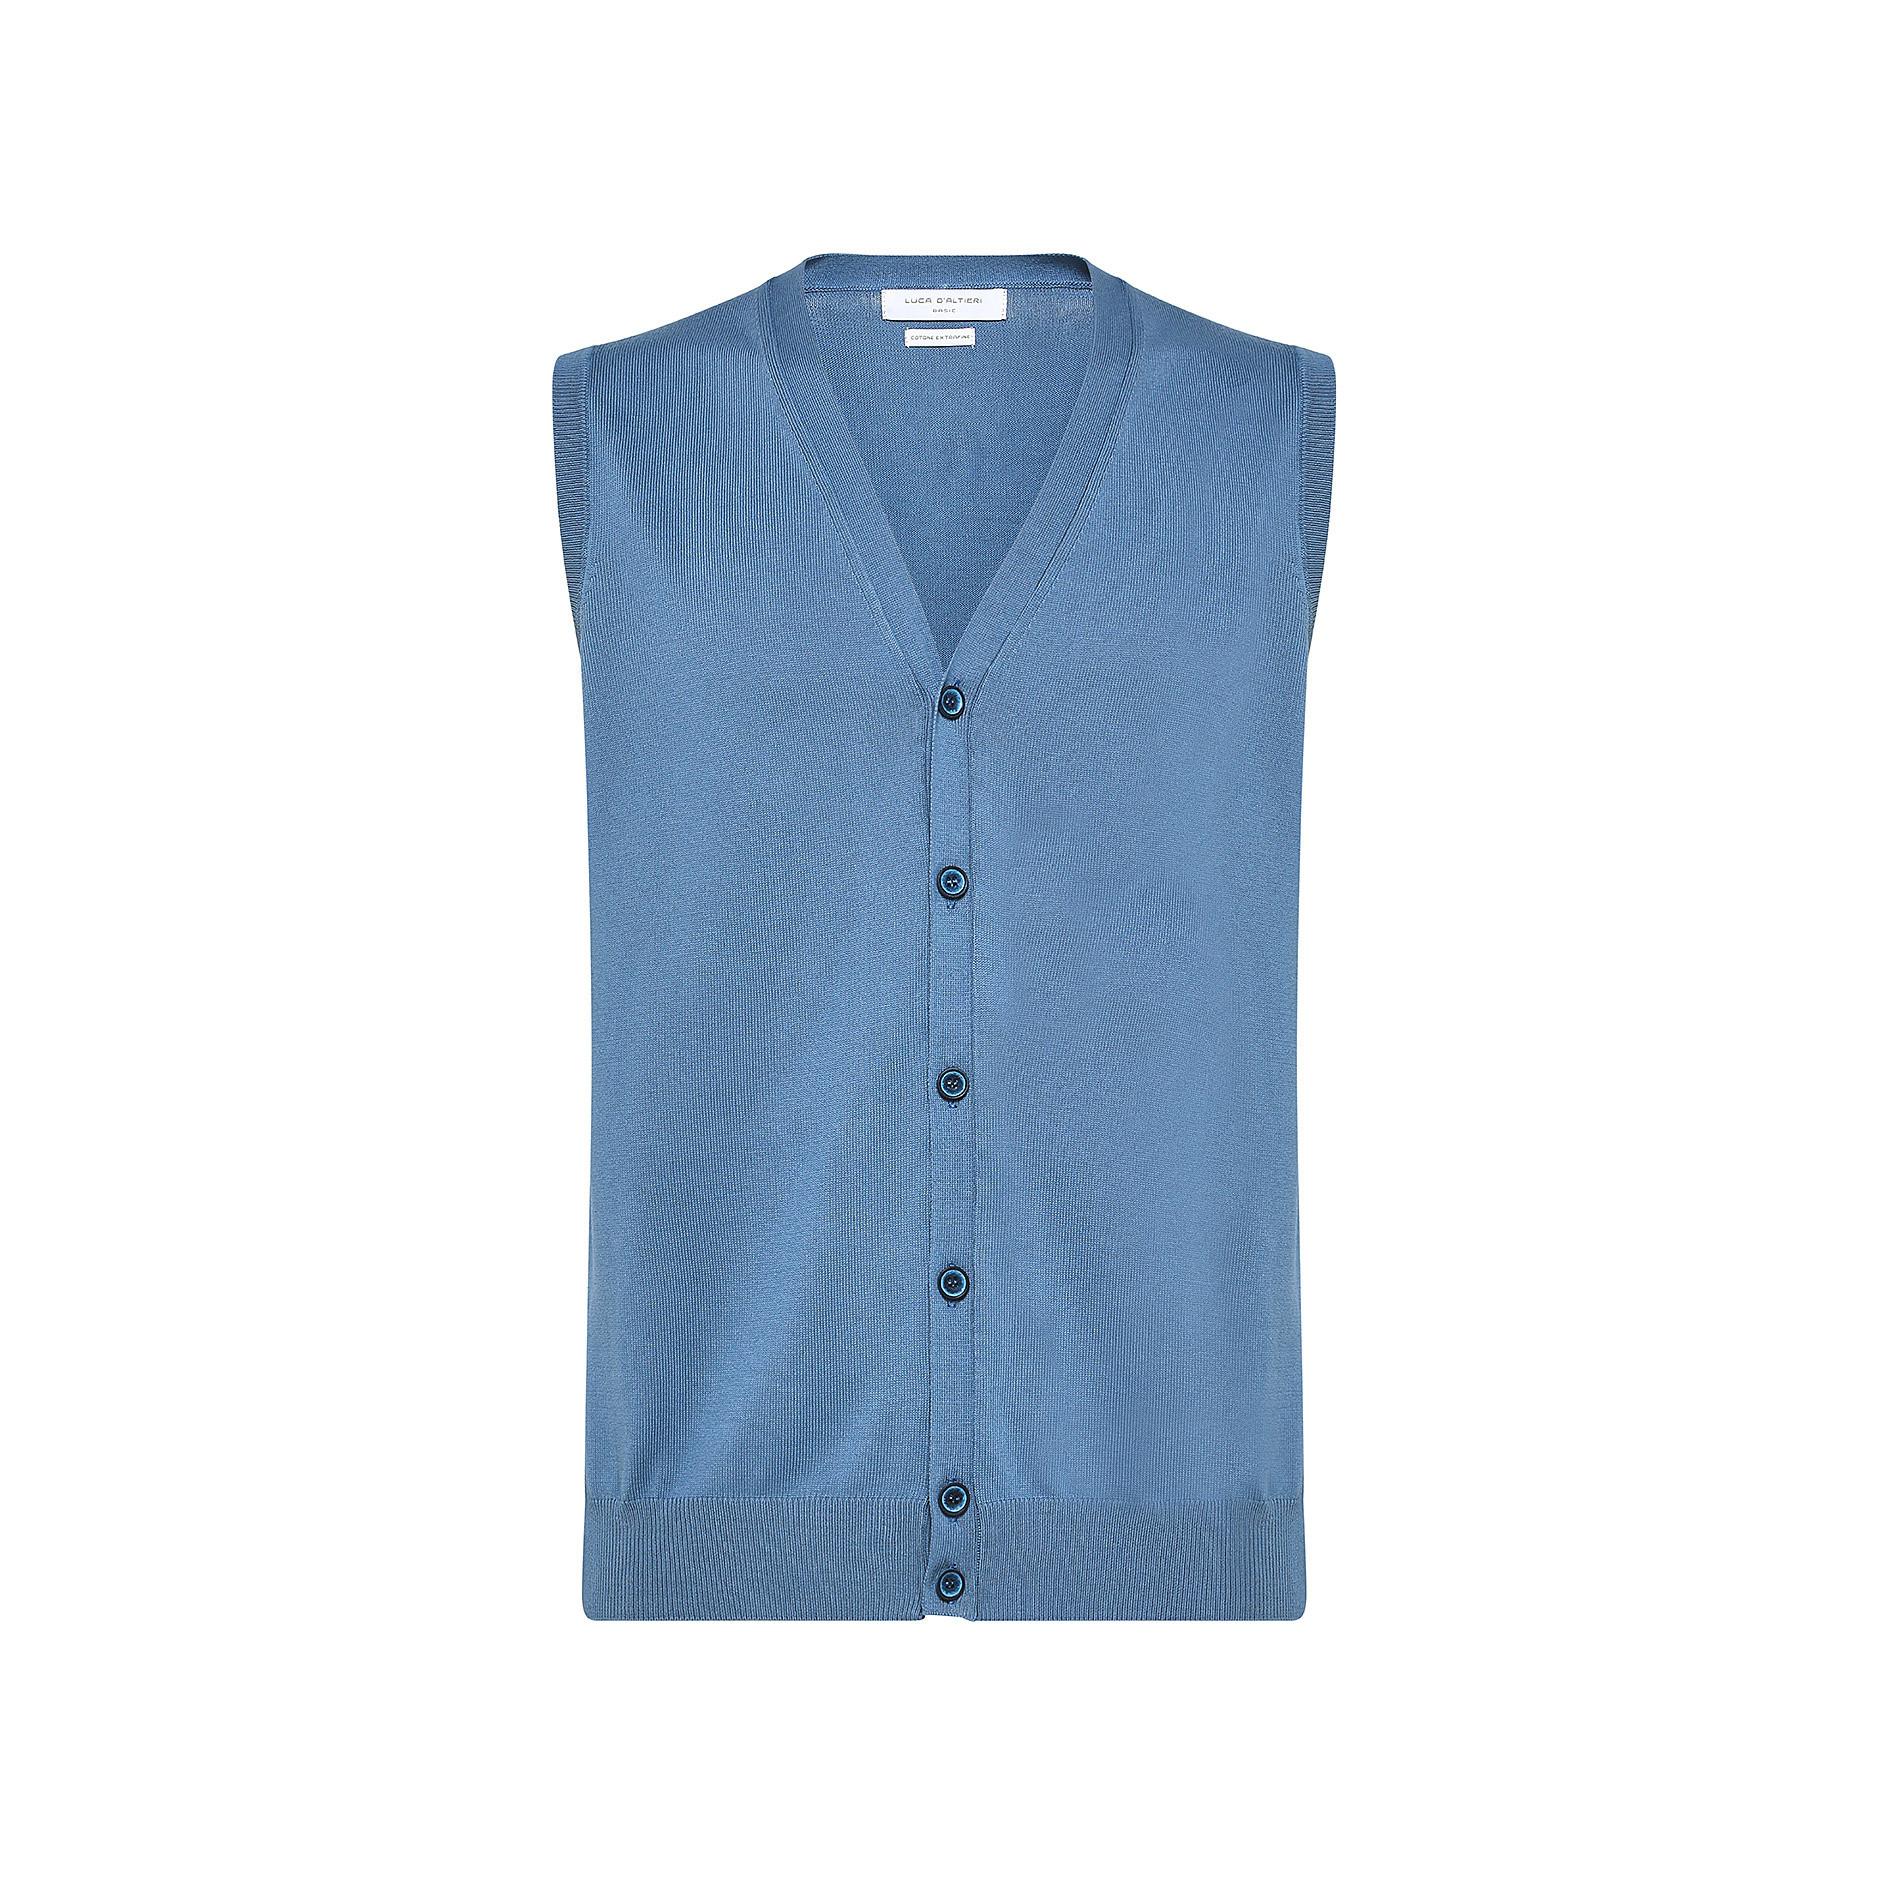 Gilet puro cotone con bottoni Luca D'Altieri, Azzurro, large image number 0